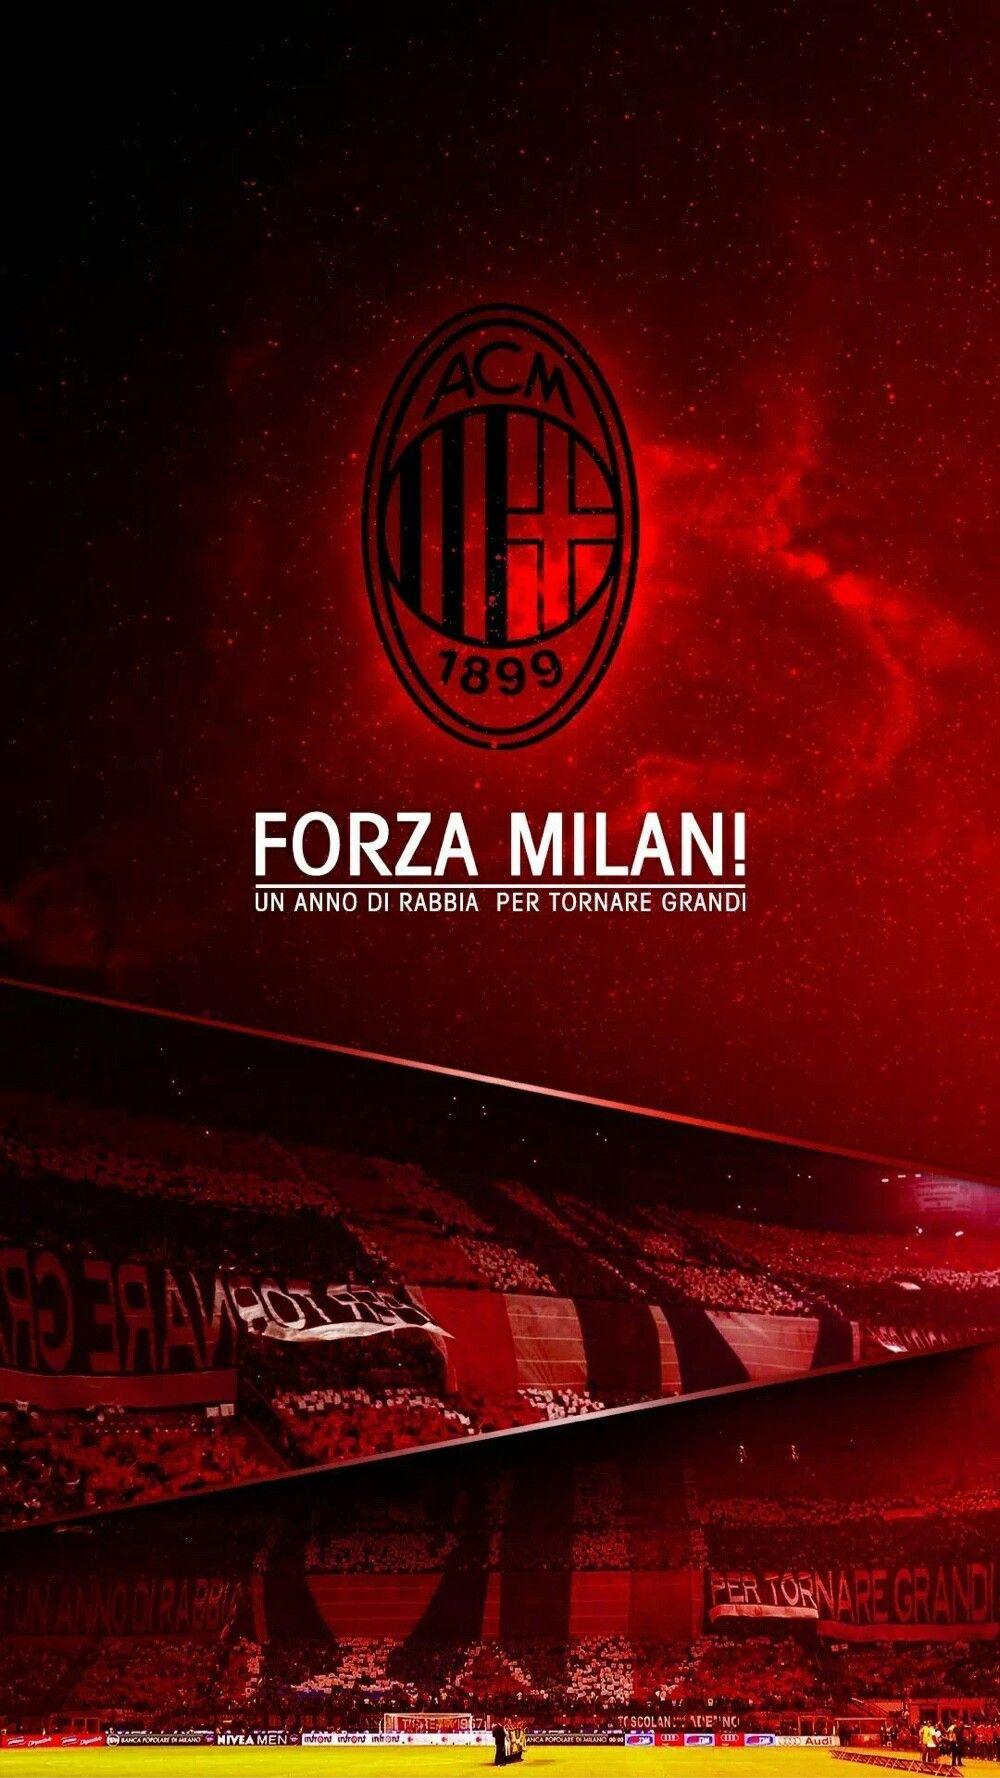 # FORZA MILAN